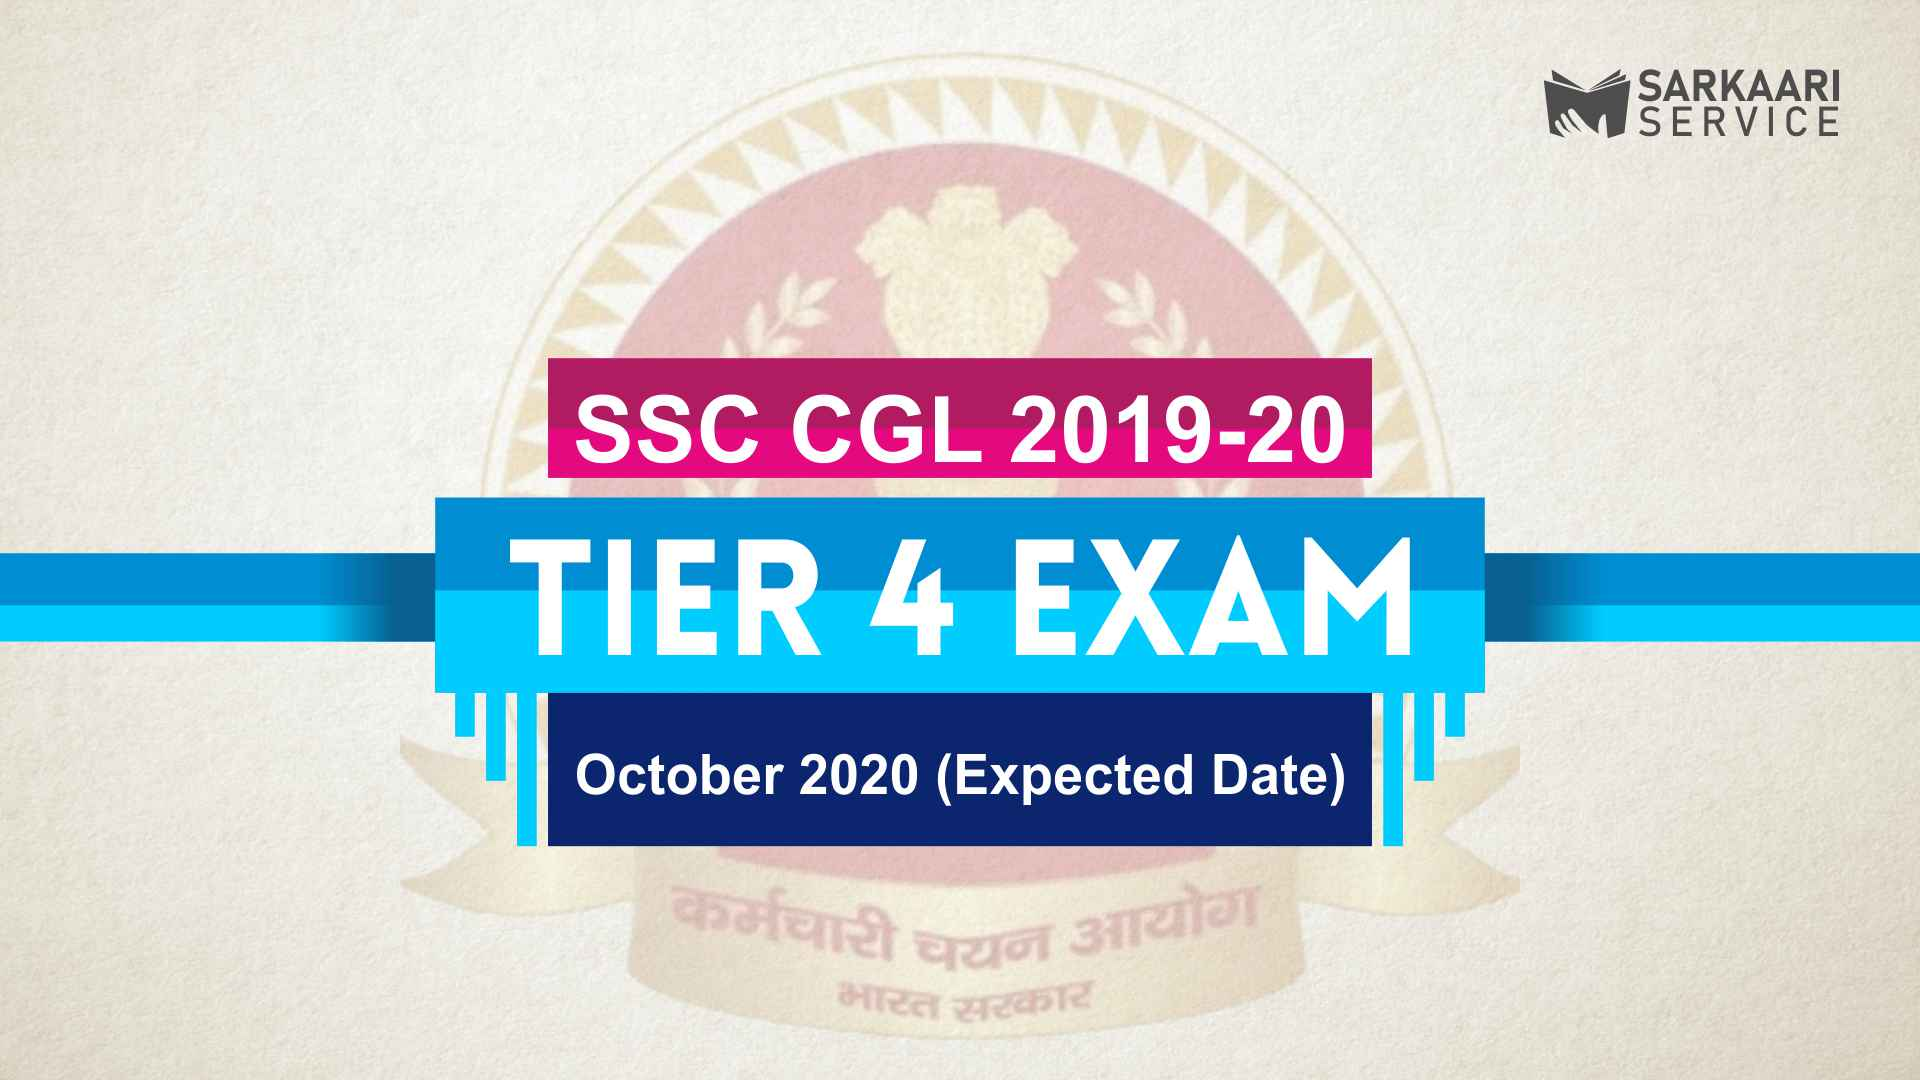 SSC CGL Tier 4 Exam Date 2019-20